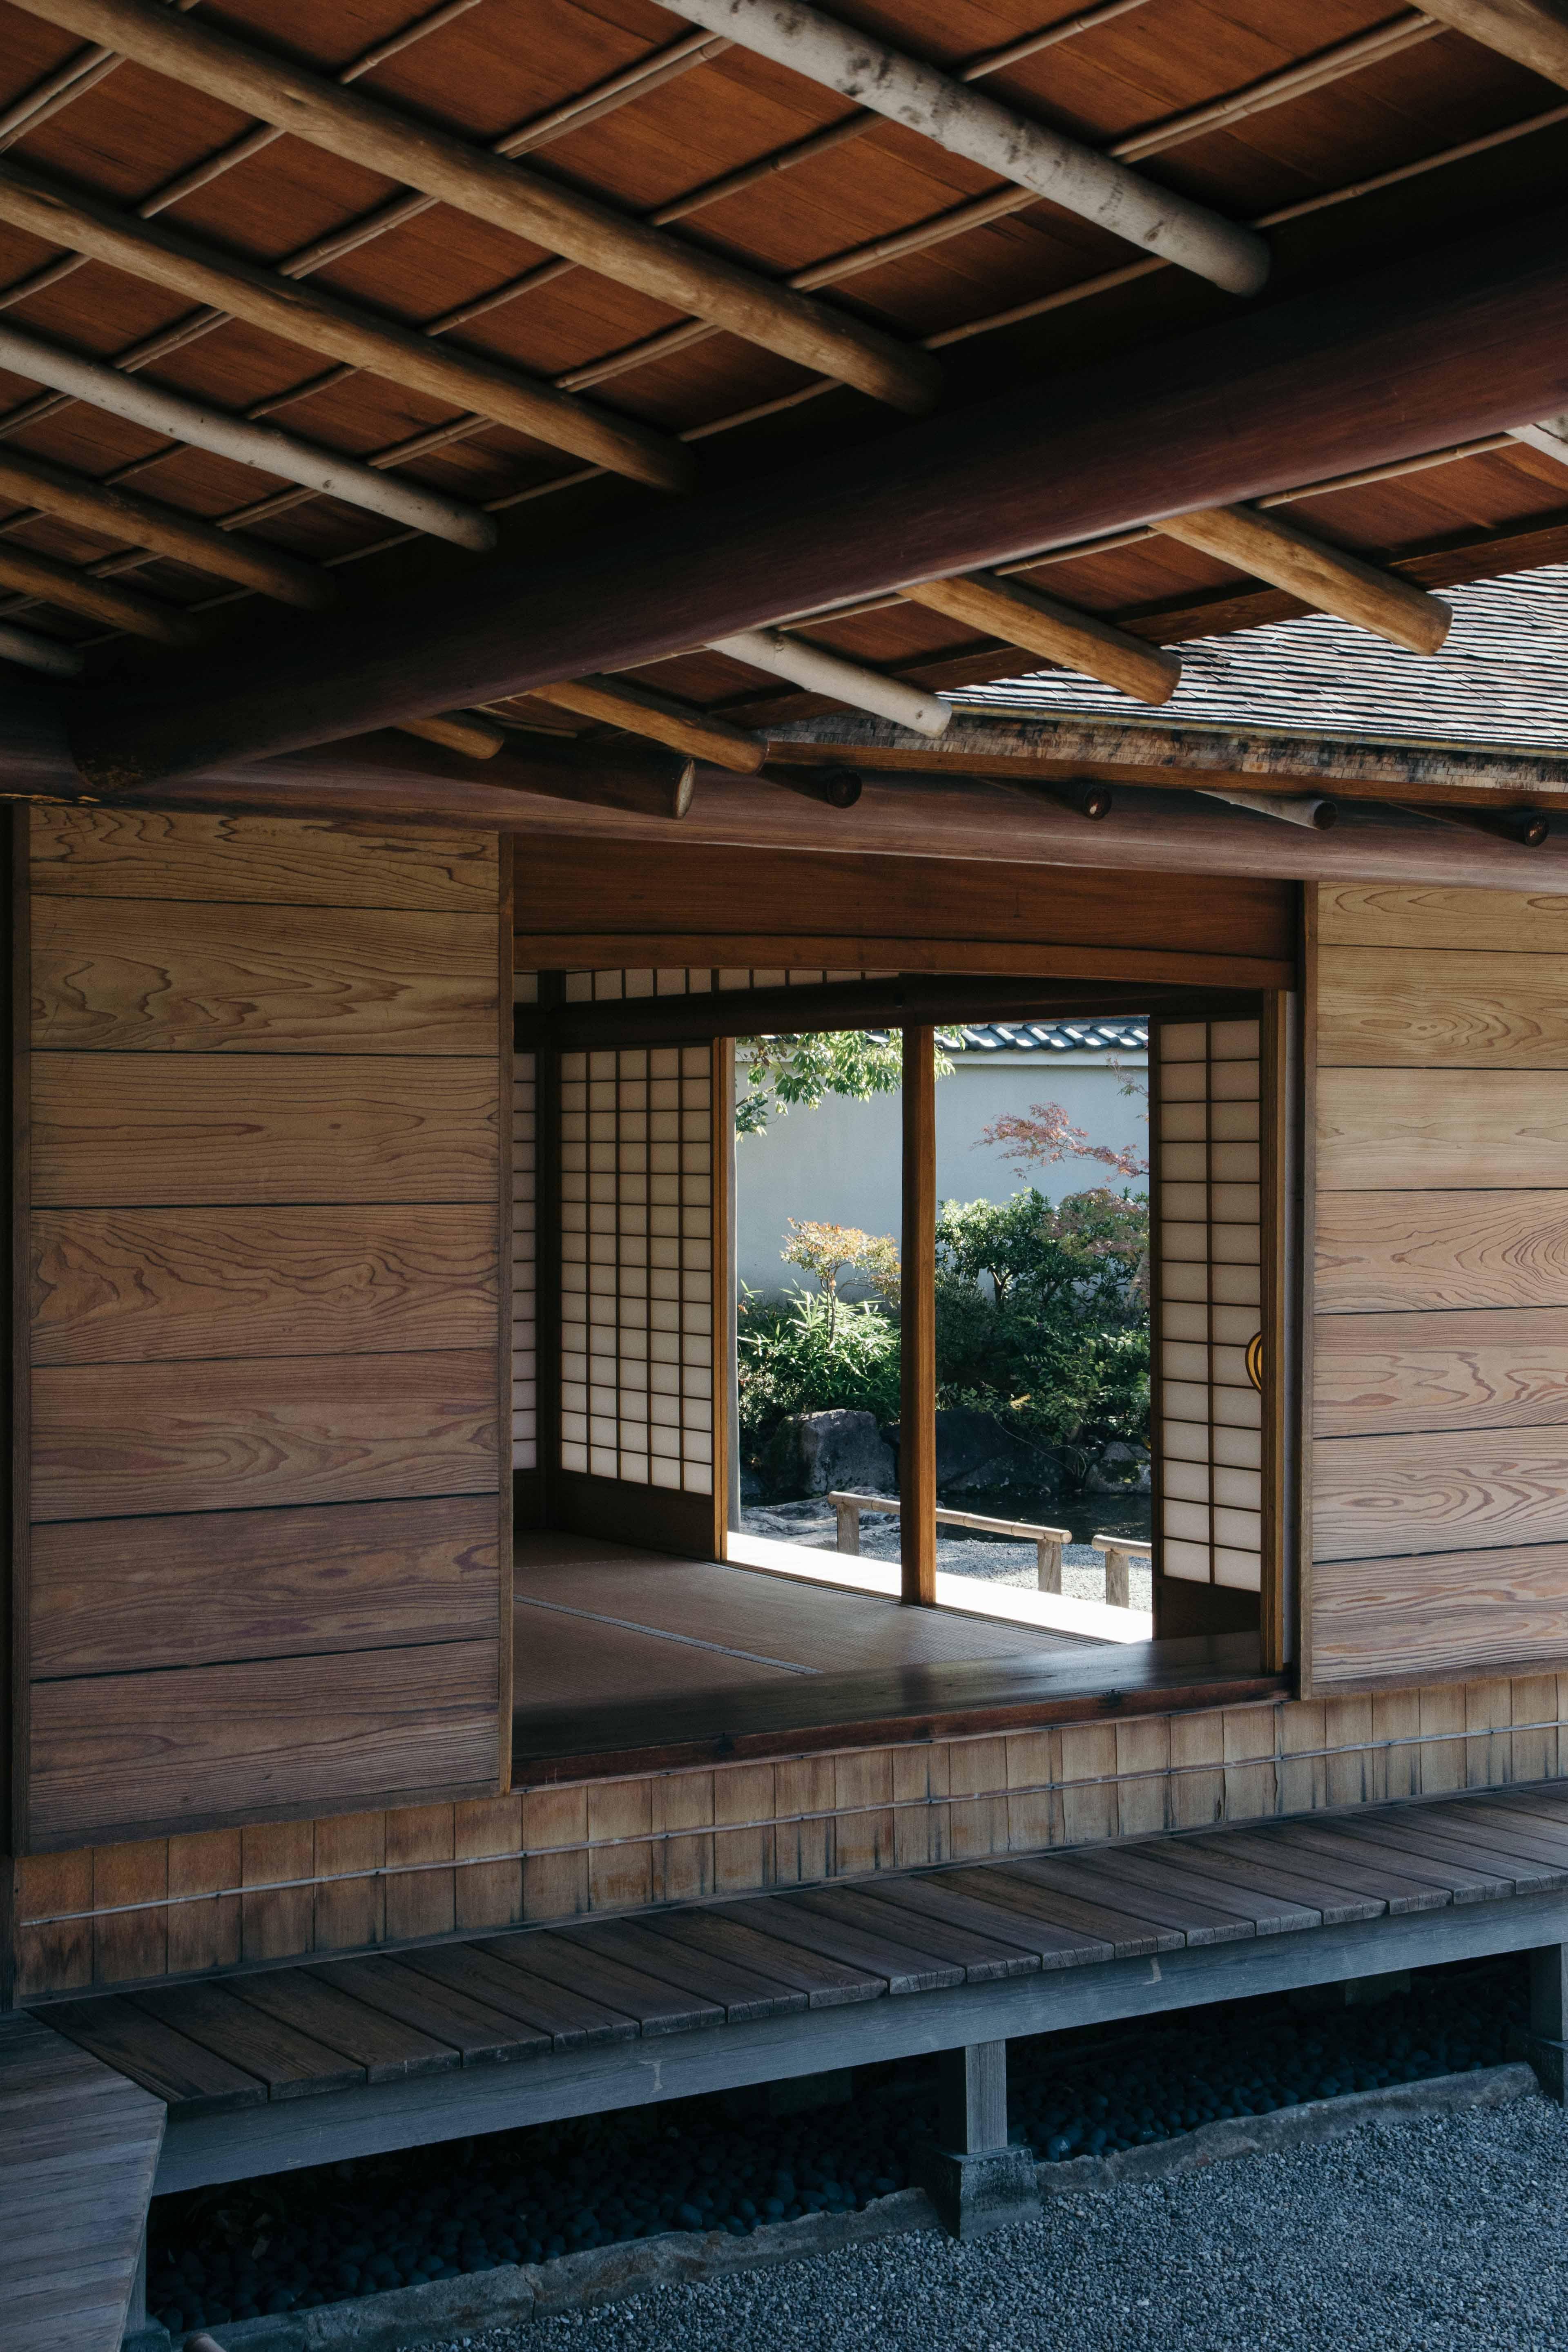 Visiter le jardin pittoresque de Yoyokan dans la prefecture de Fukui au Japon